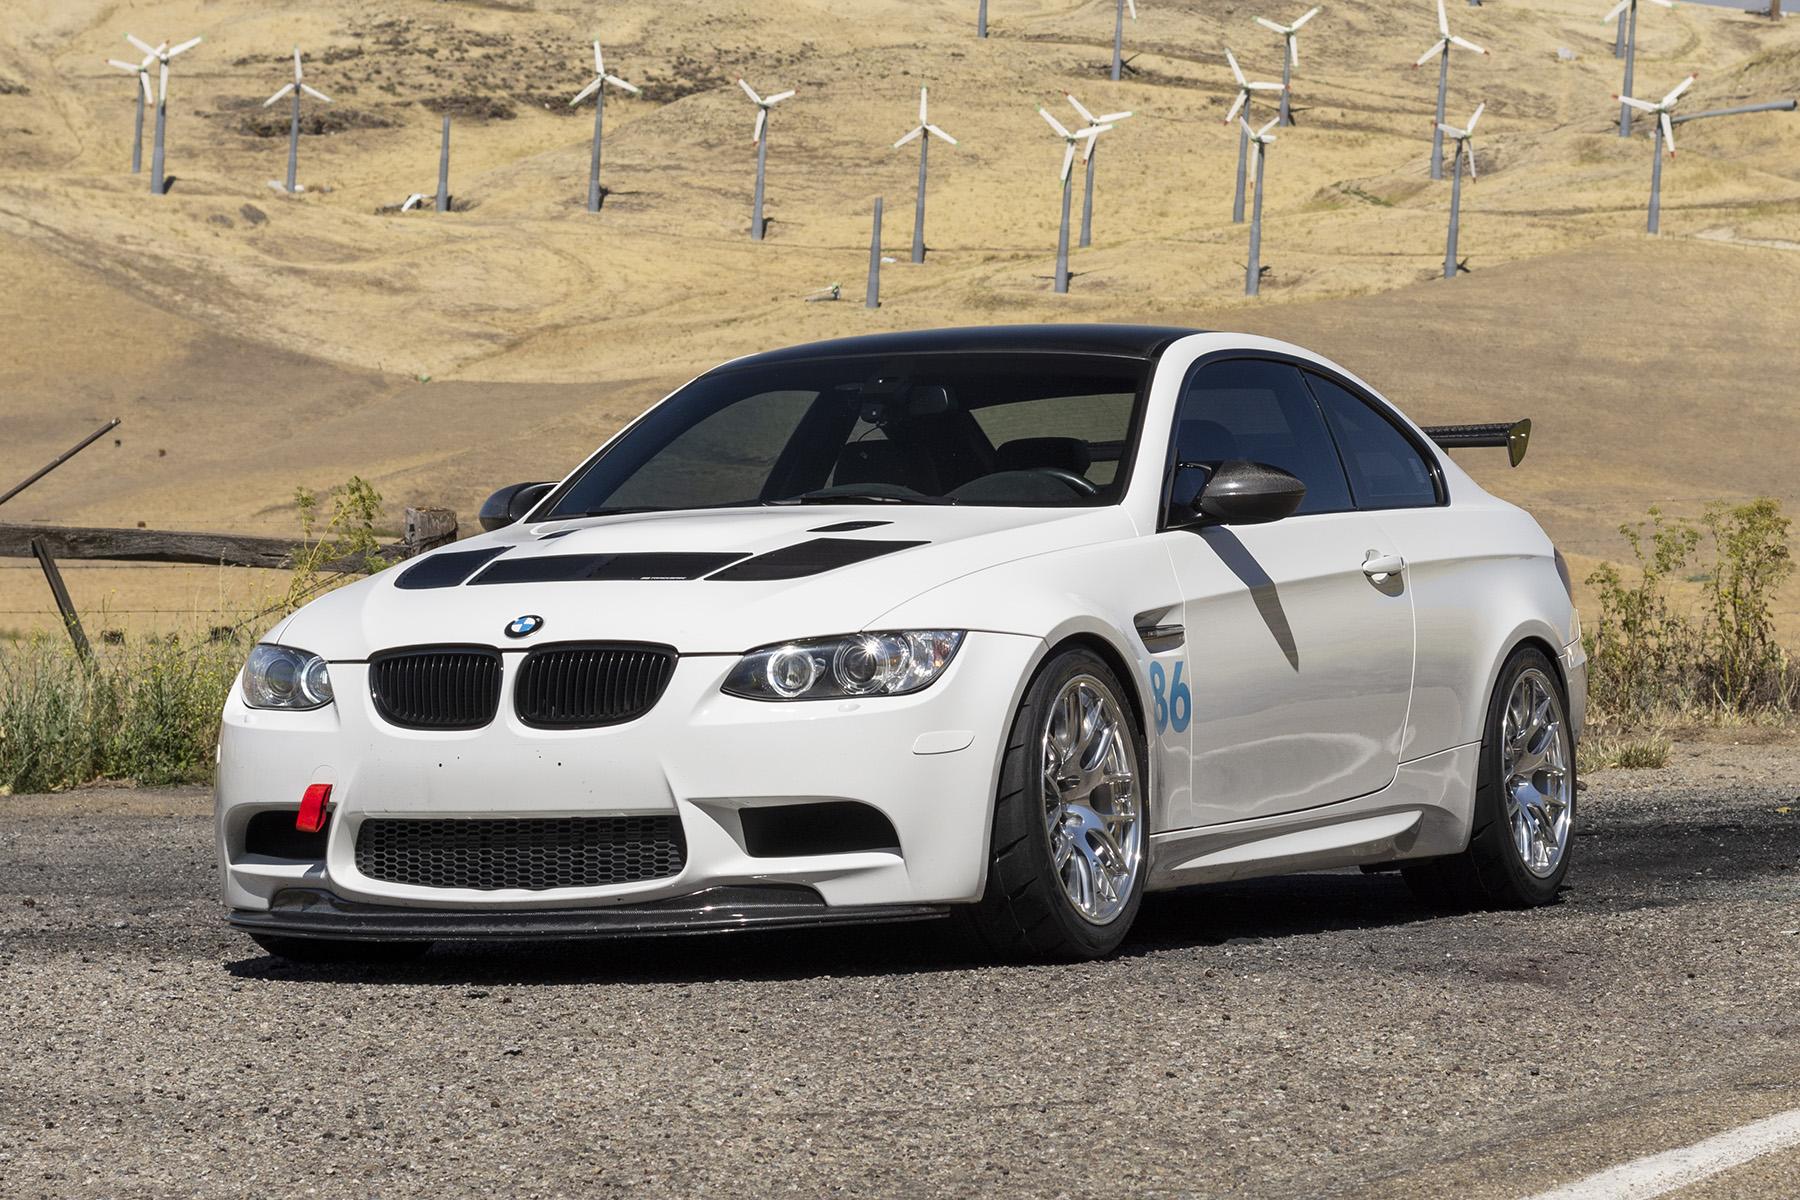 "BMW E92 M3 with 18"" EC-7R Forged Wheels"